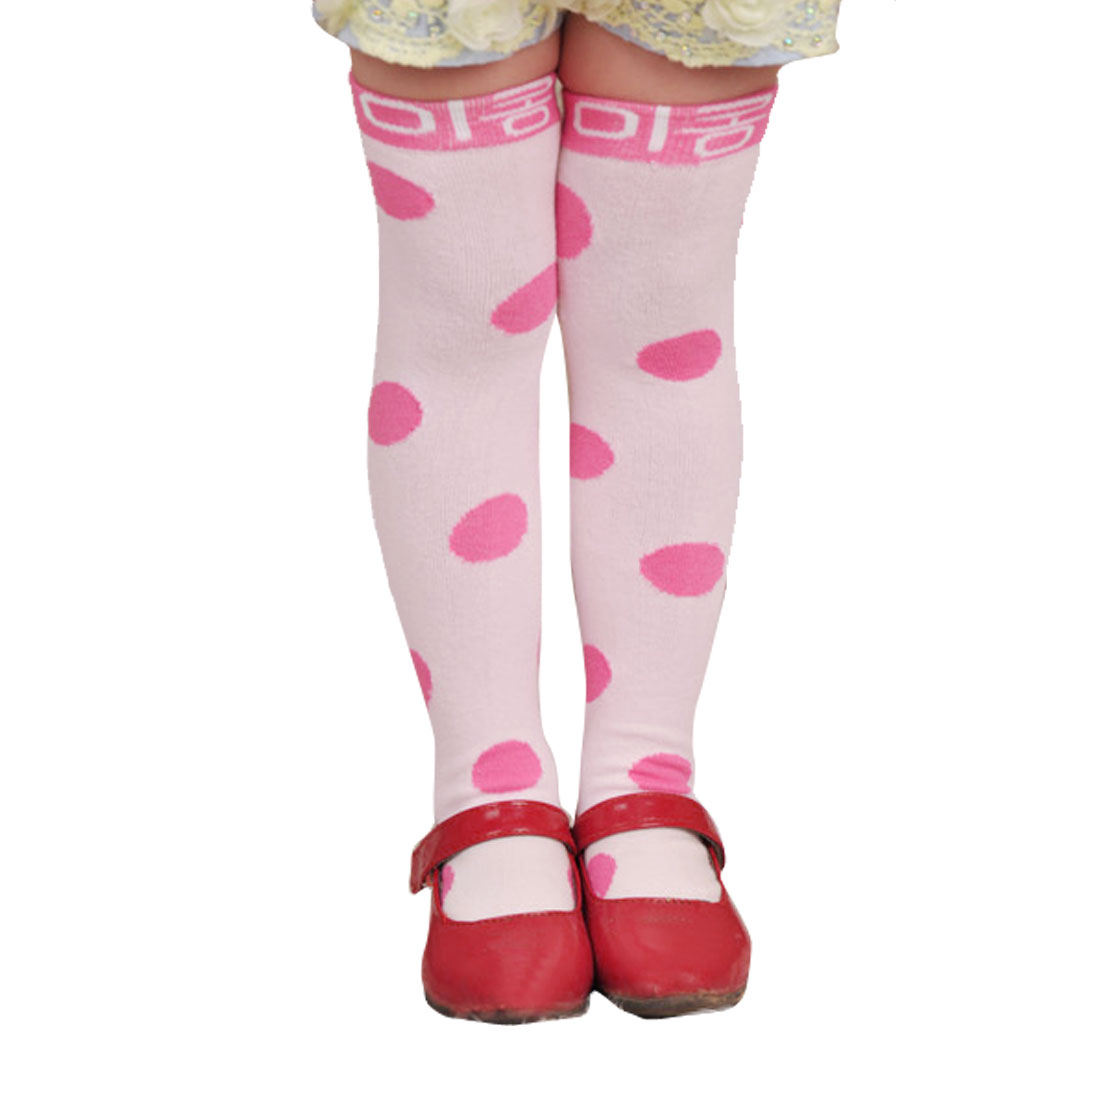 2-8T Kids Toddlers Girls Fuchsia Spotty Print Soft Stretch Knee High Socks Pink